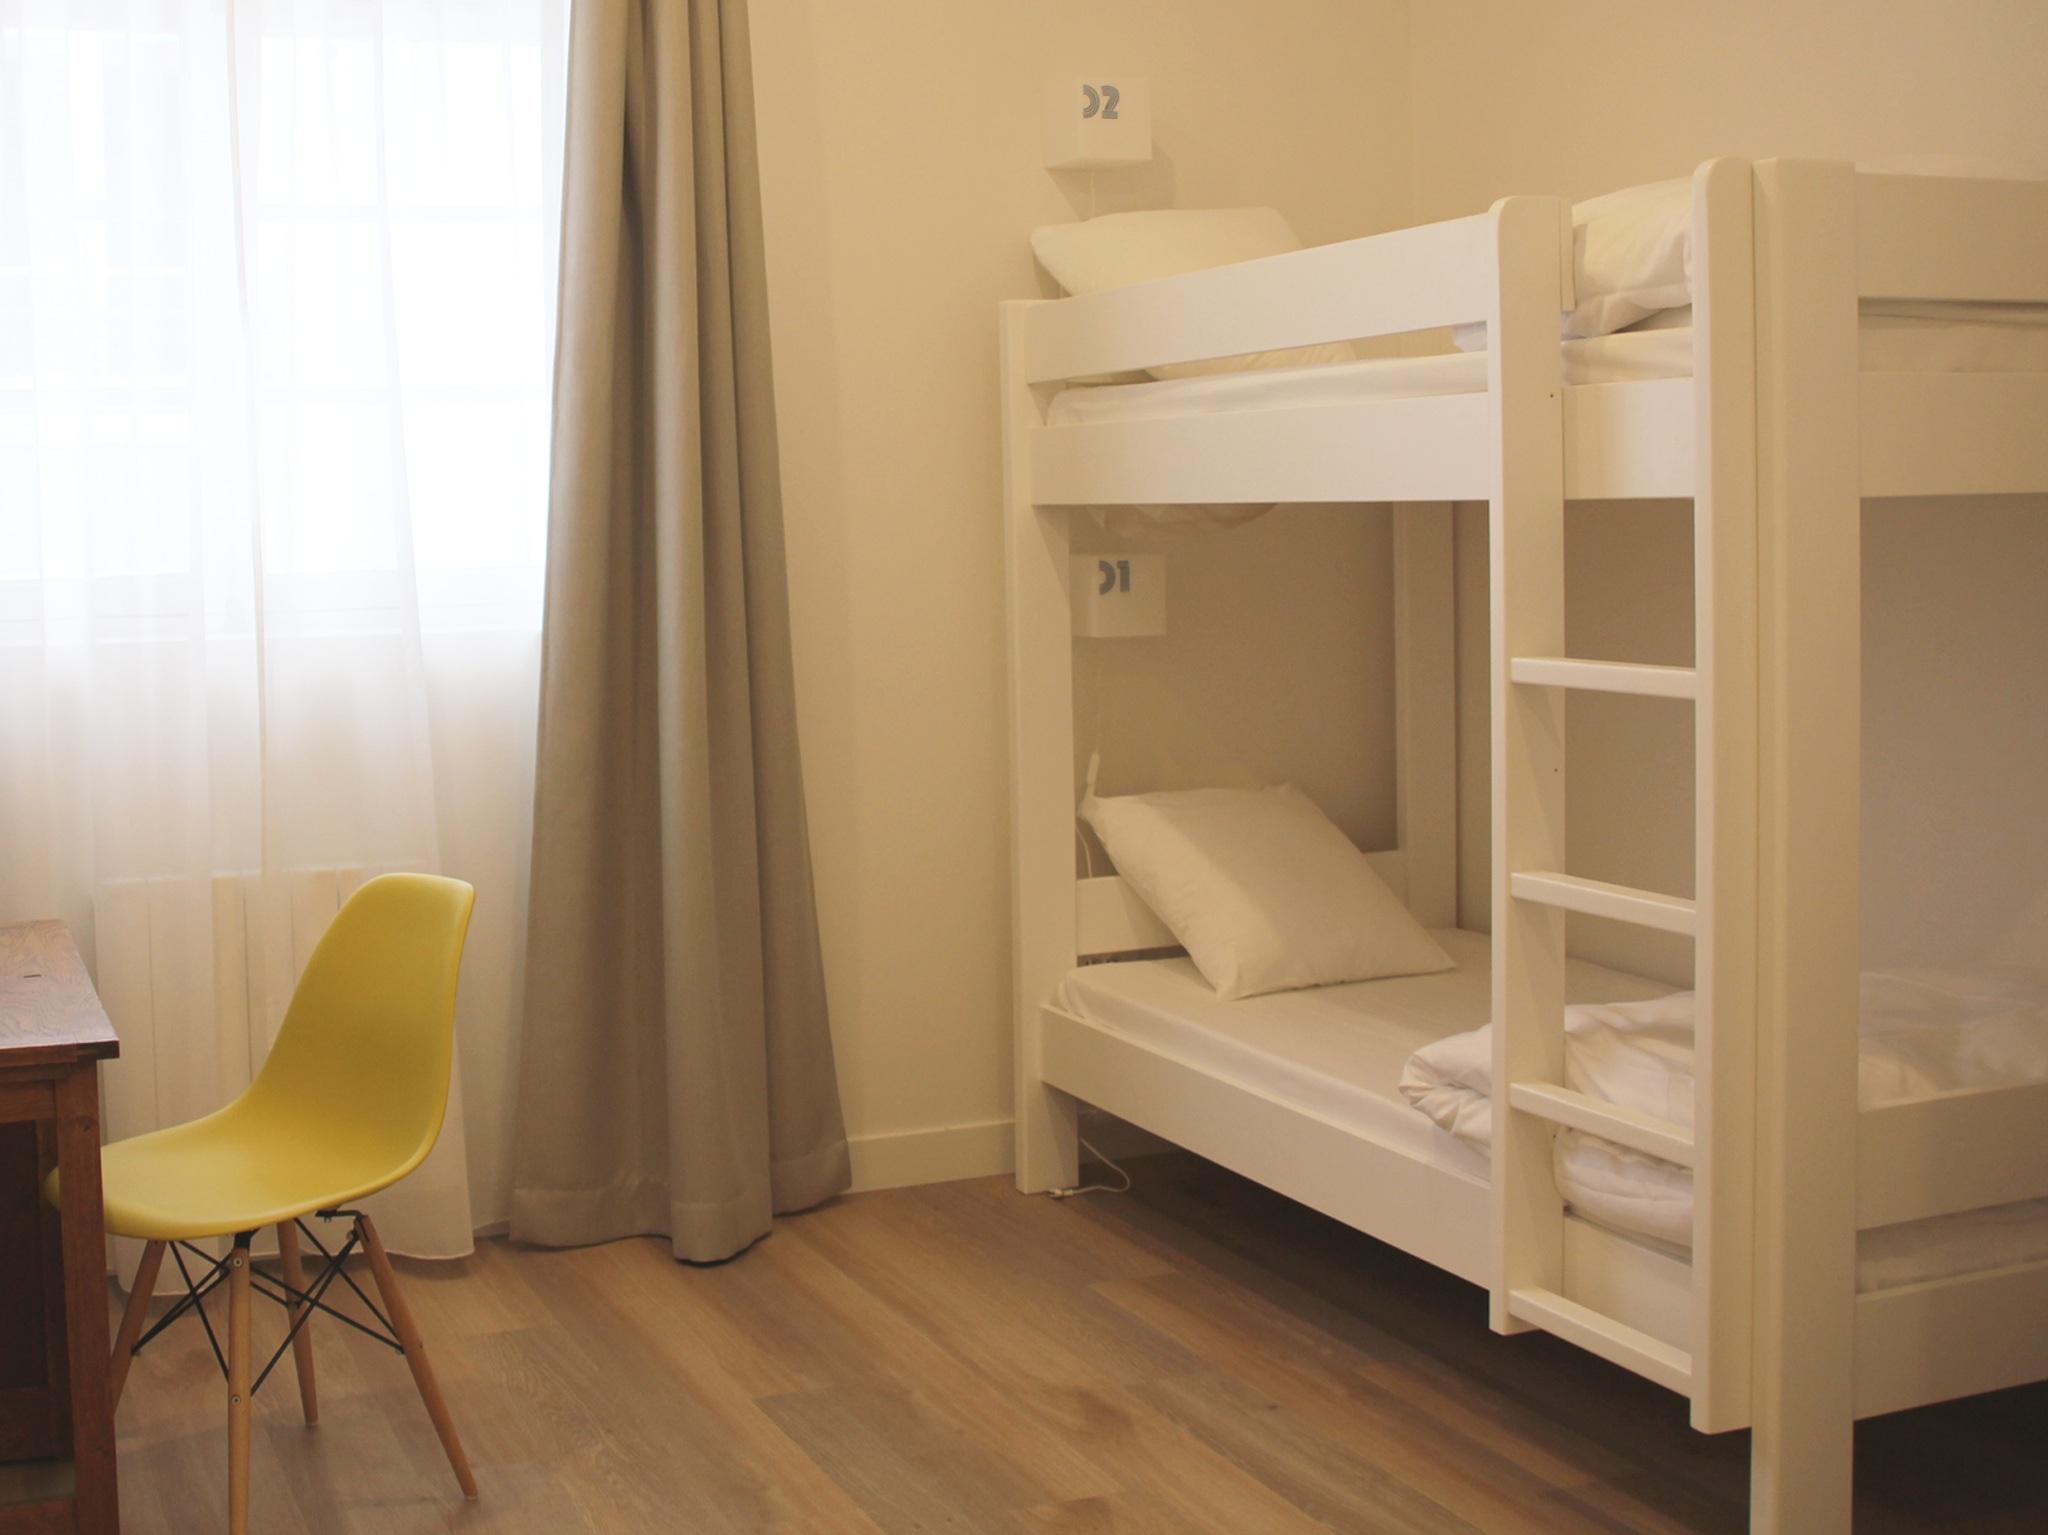 slo living a concept of hostel like in lyon expat. Black Bedroom Furniture Sets. Home Design Ideas